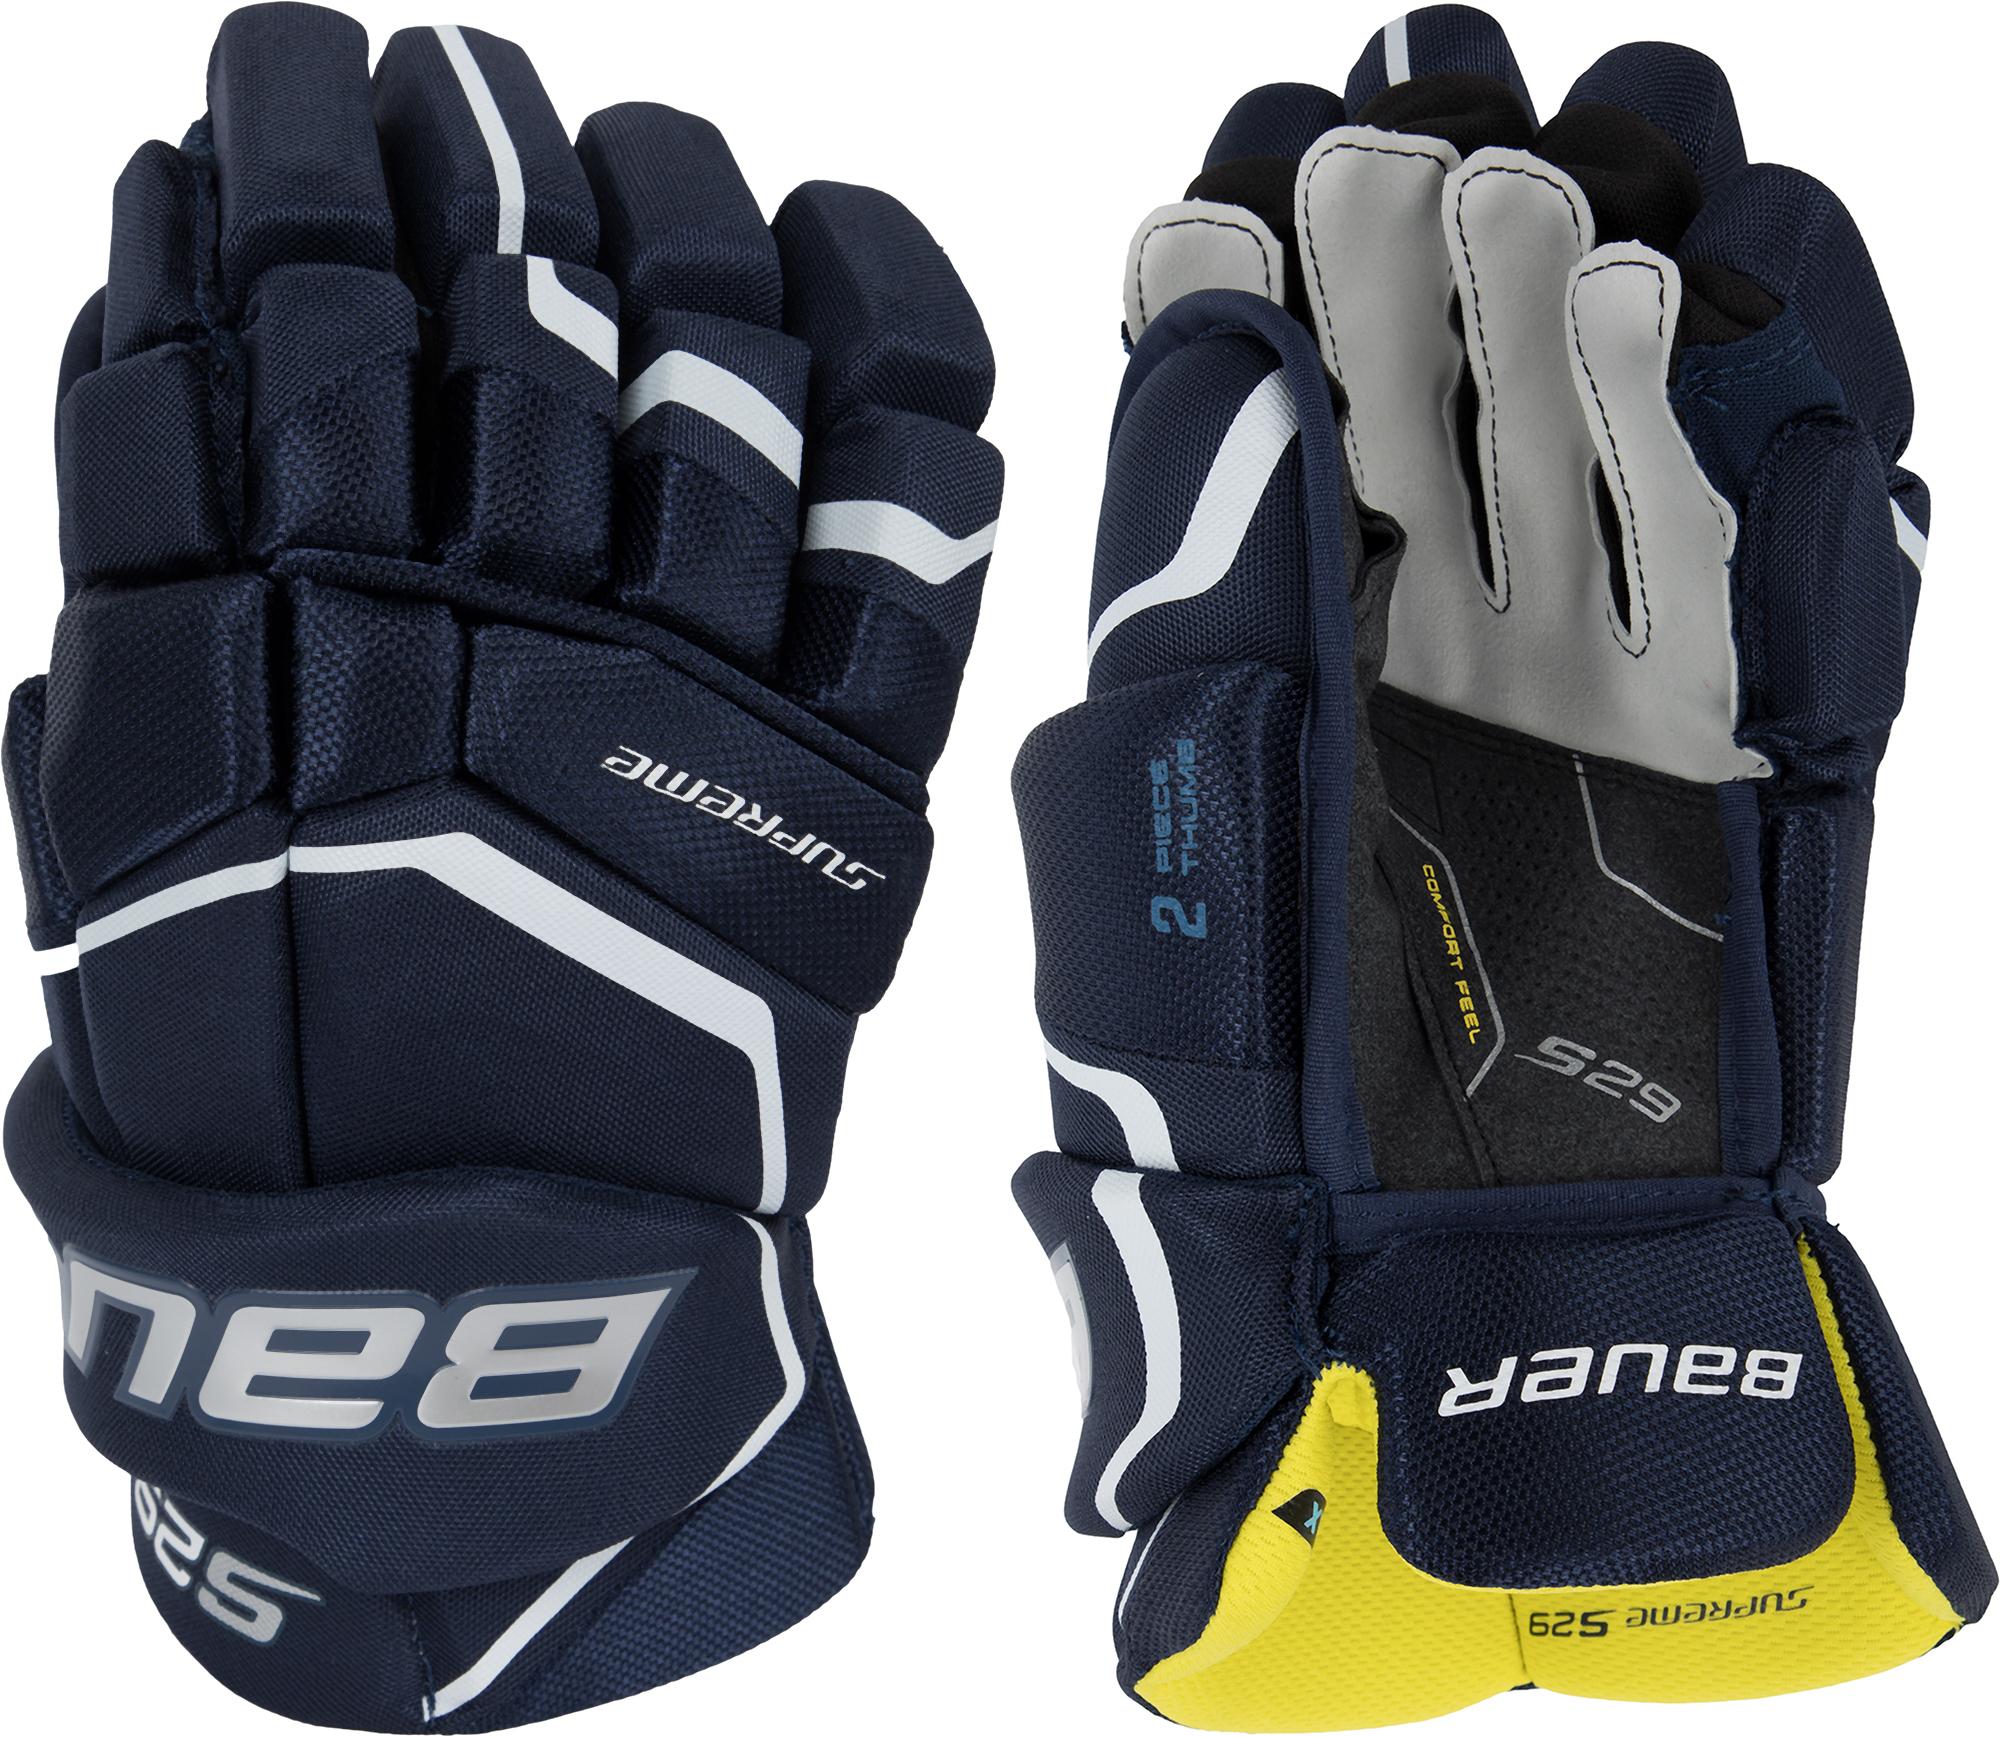 Bauer Перчатки хоккейные SUPREME S29 - SR